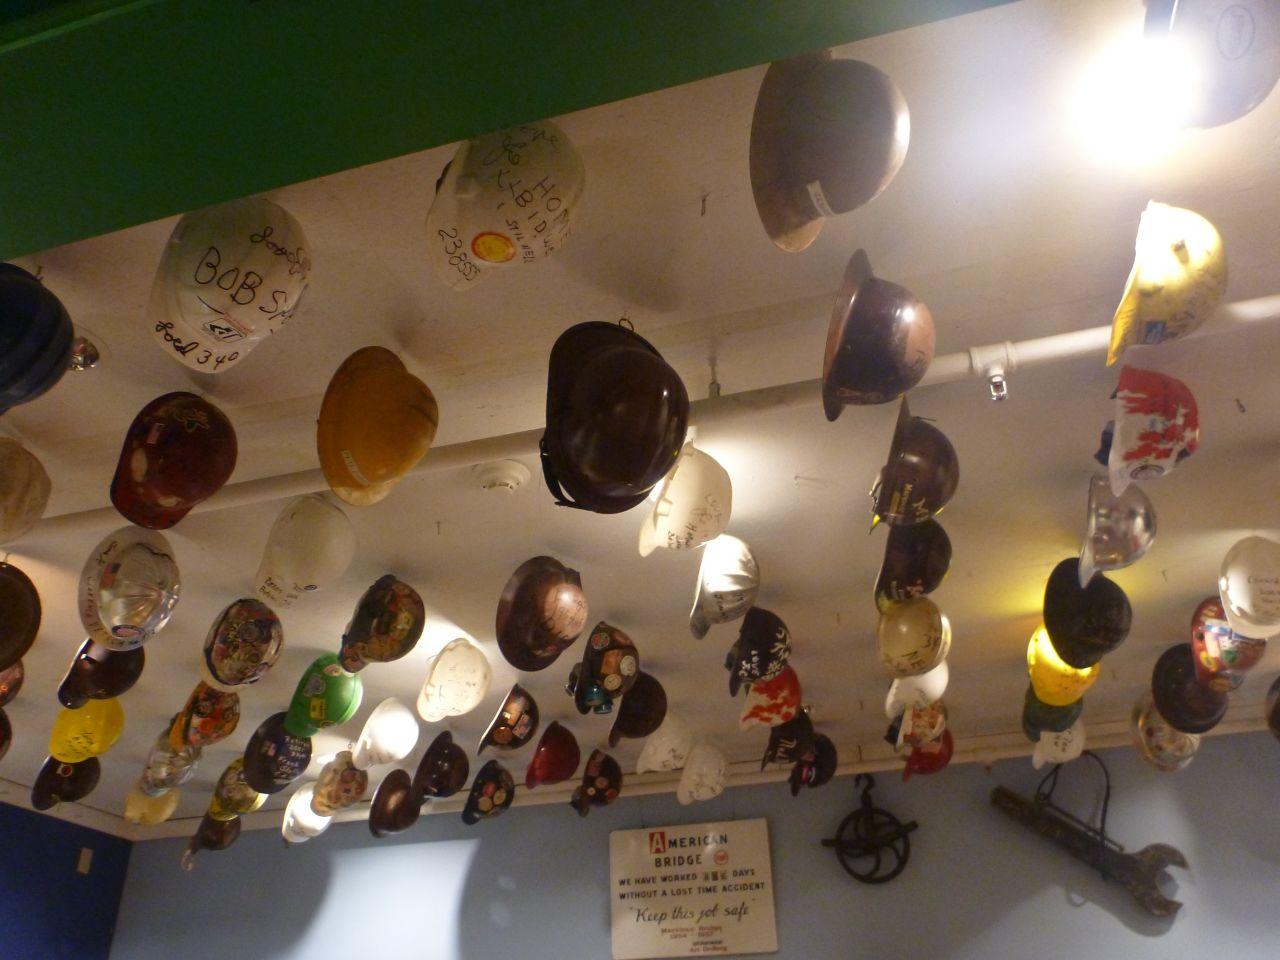 Part Of The Mackinac Bridge Museum In Mackinaw City, MI